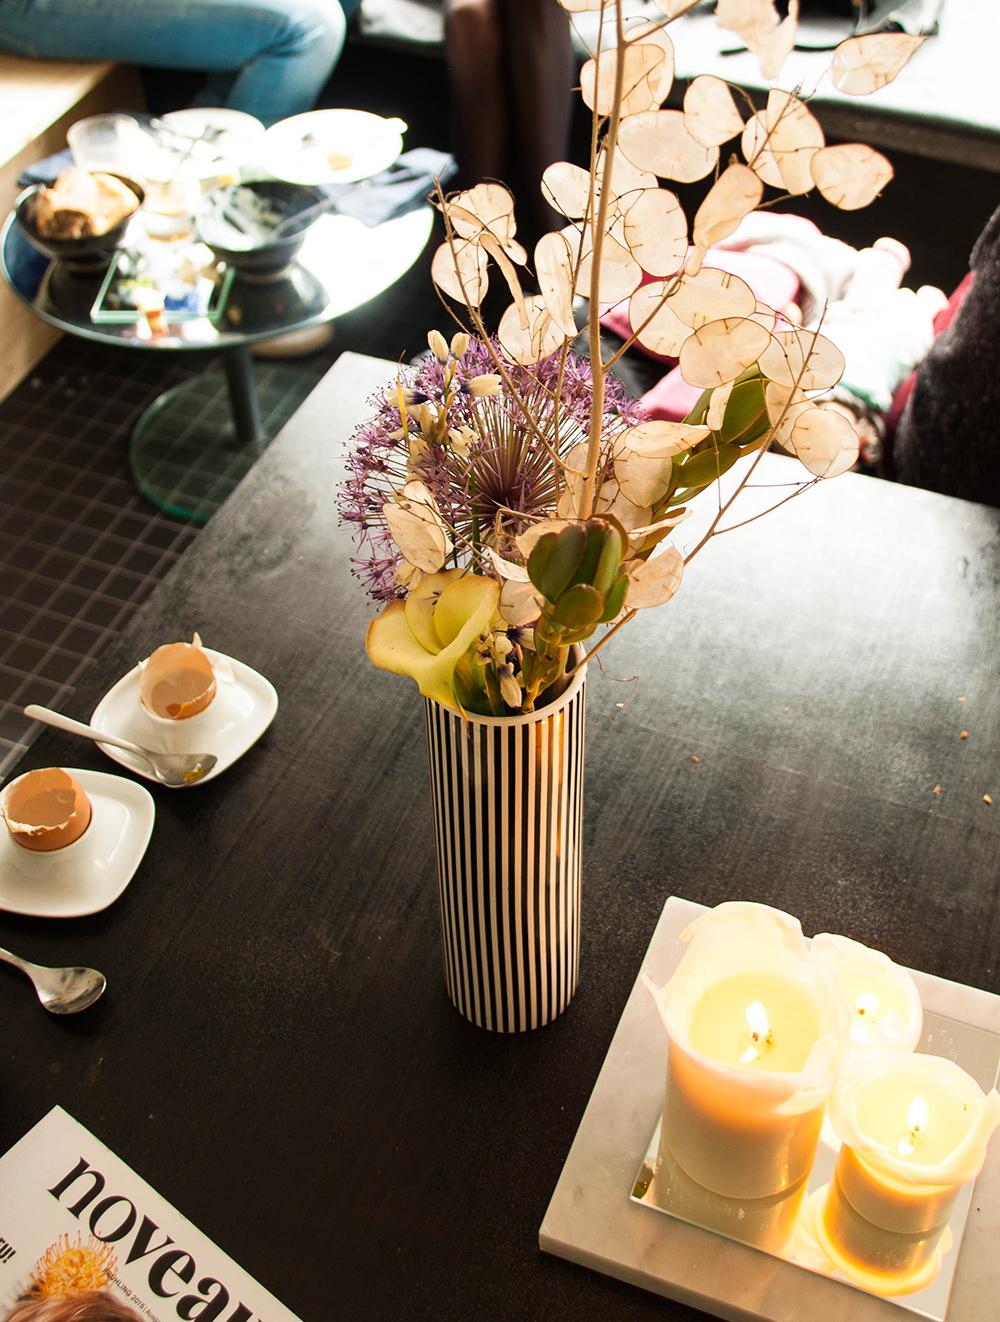 Herbary-Cafe-Y-Lea-Lou-1